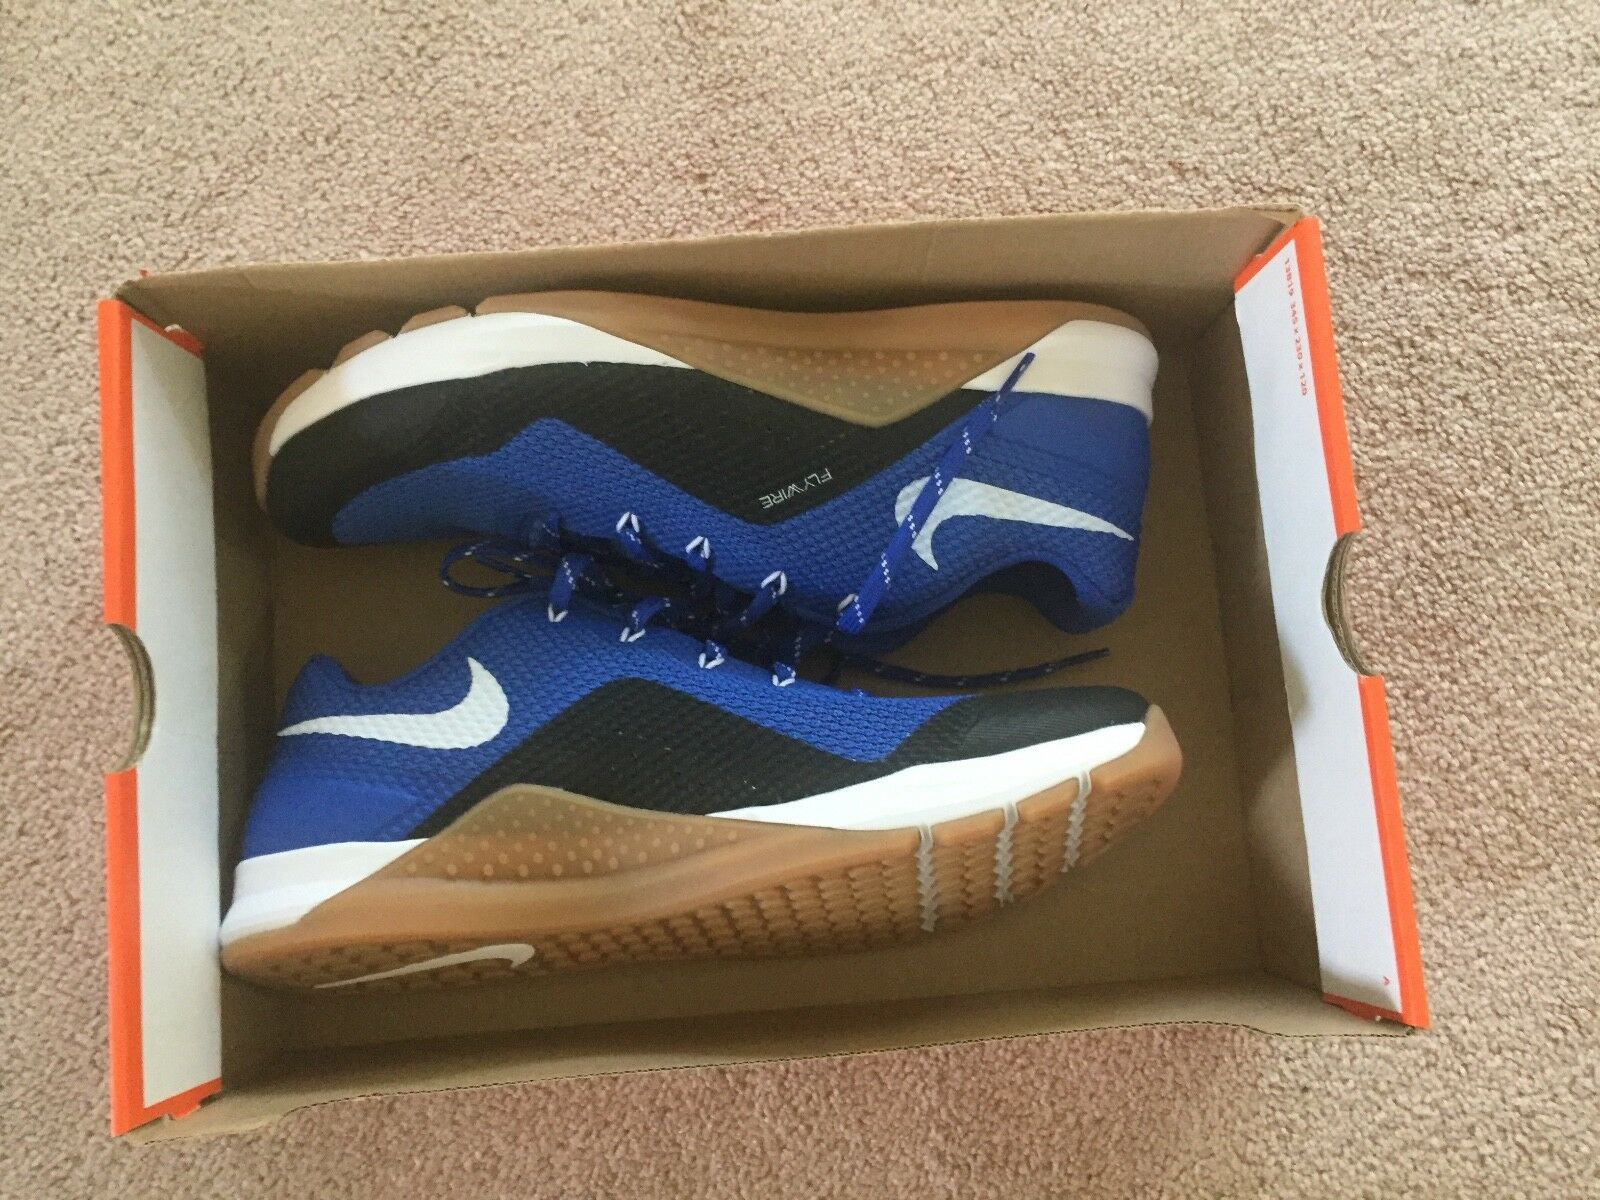 New Nike Metcon Duke bluee Devisl Repper DSX DSX DSX Size 11 Royal bluee White 921215-400 e43029